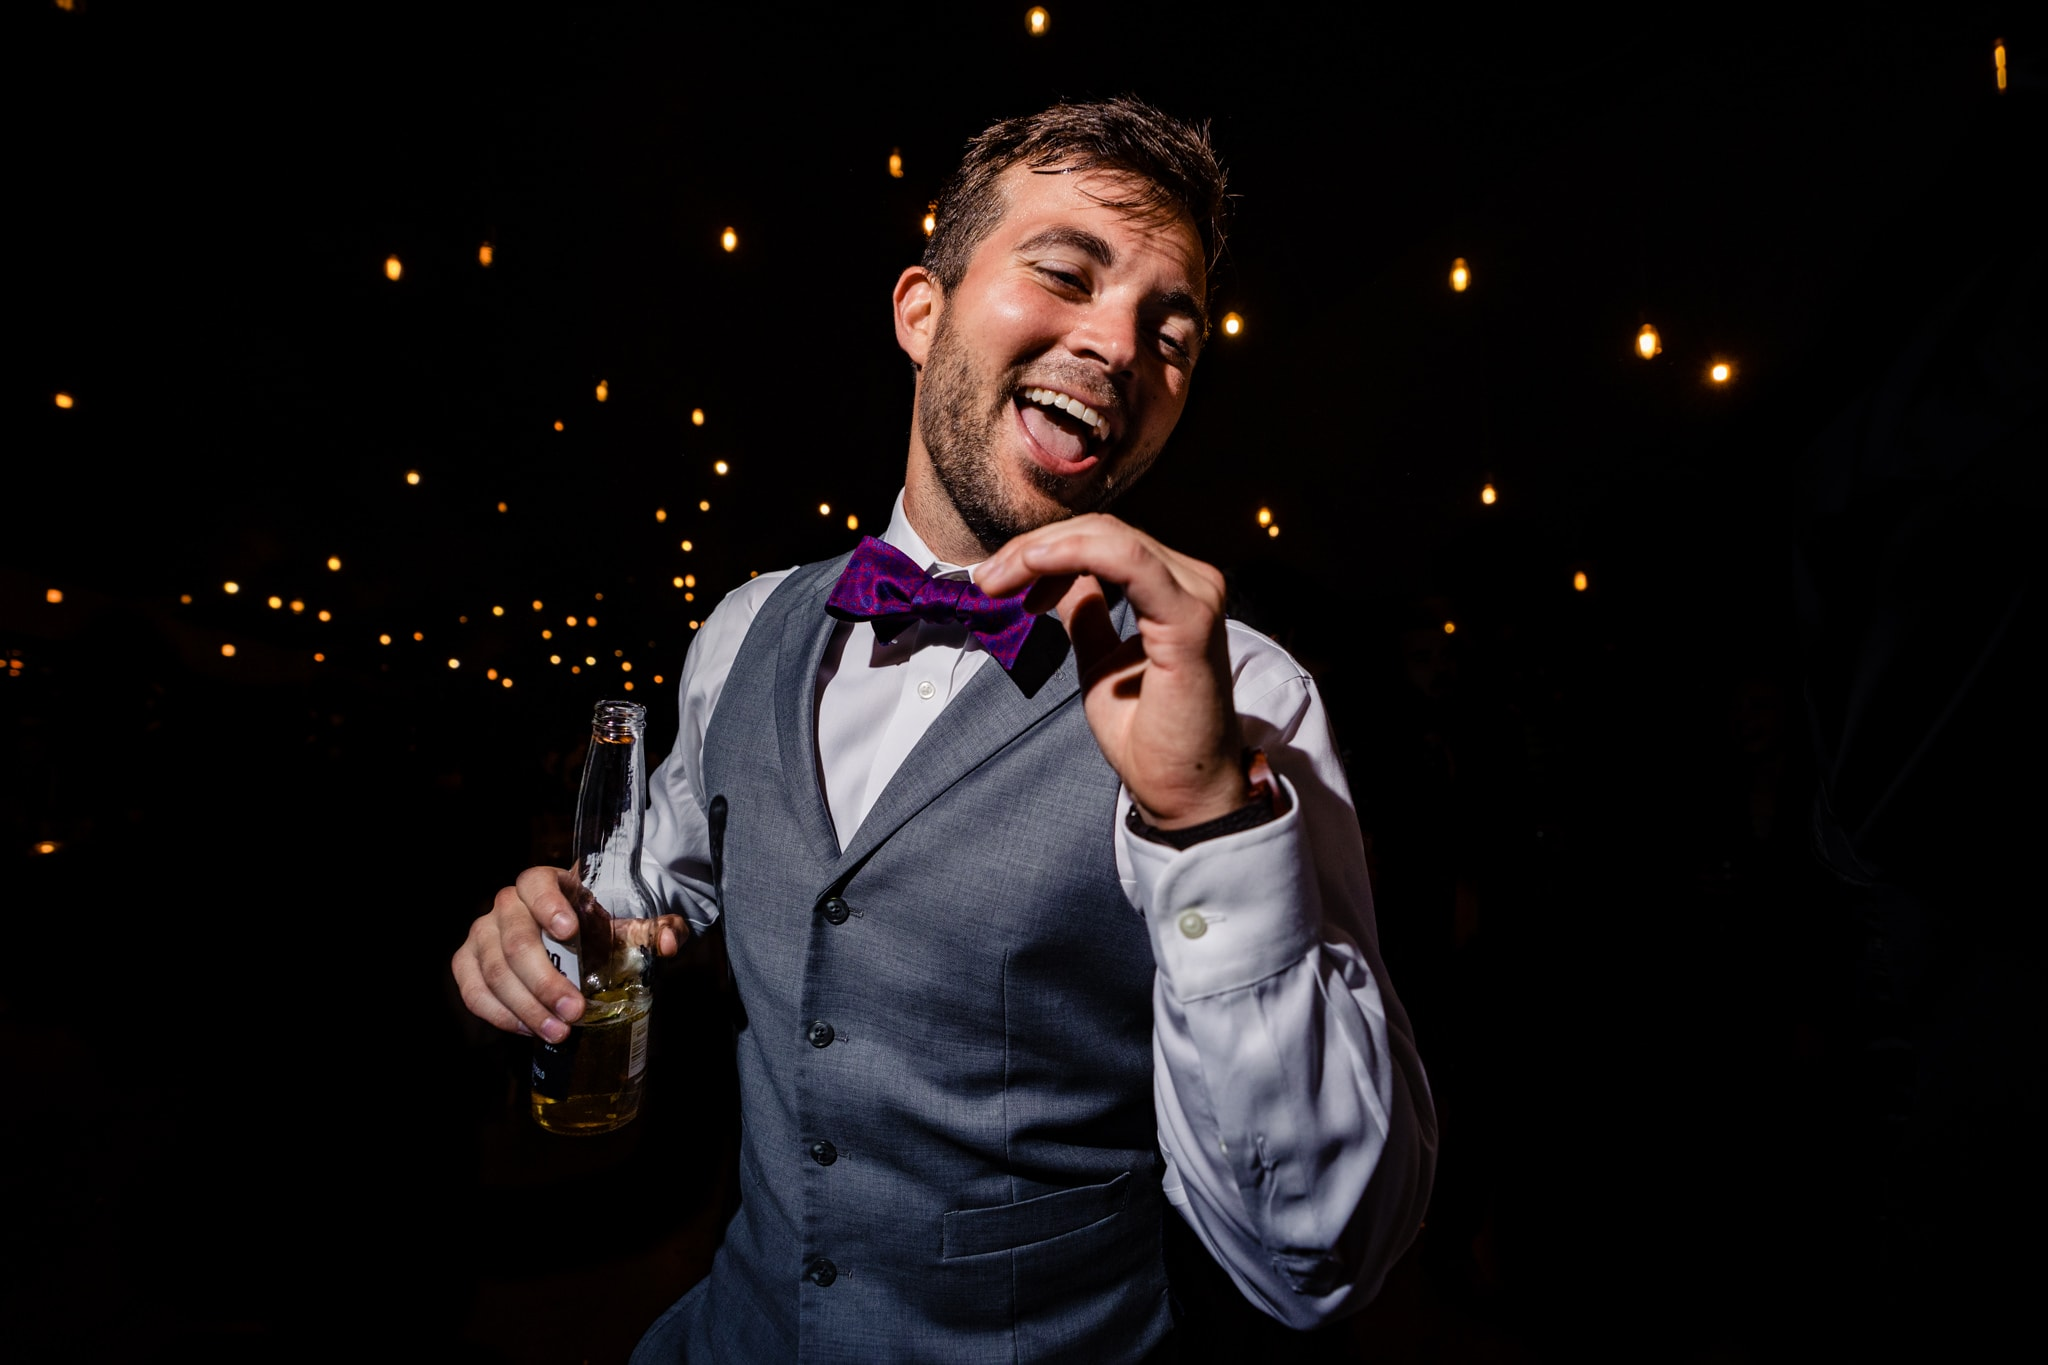 Wedding guest dancing at reception